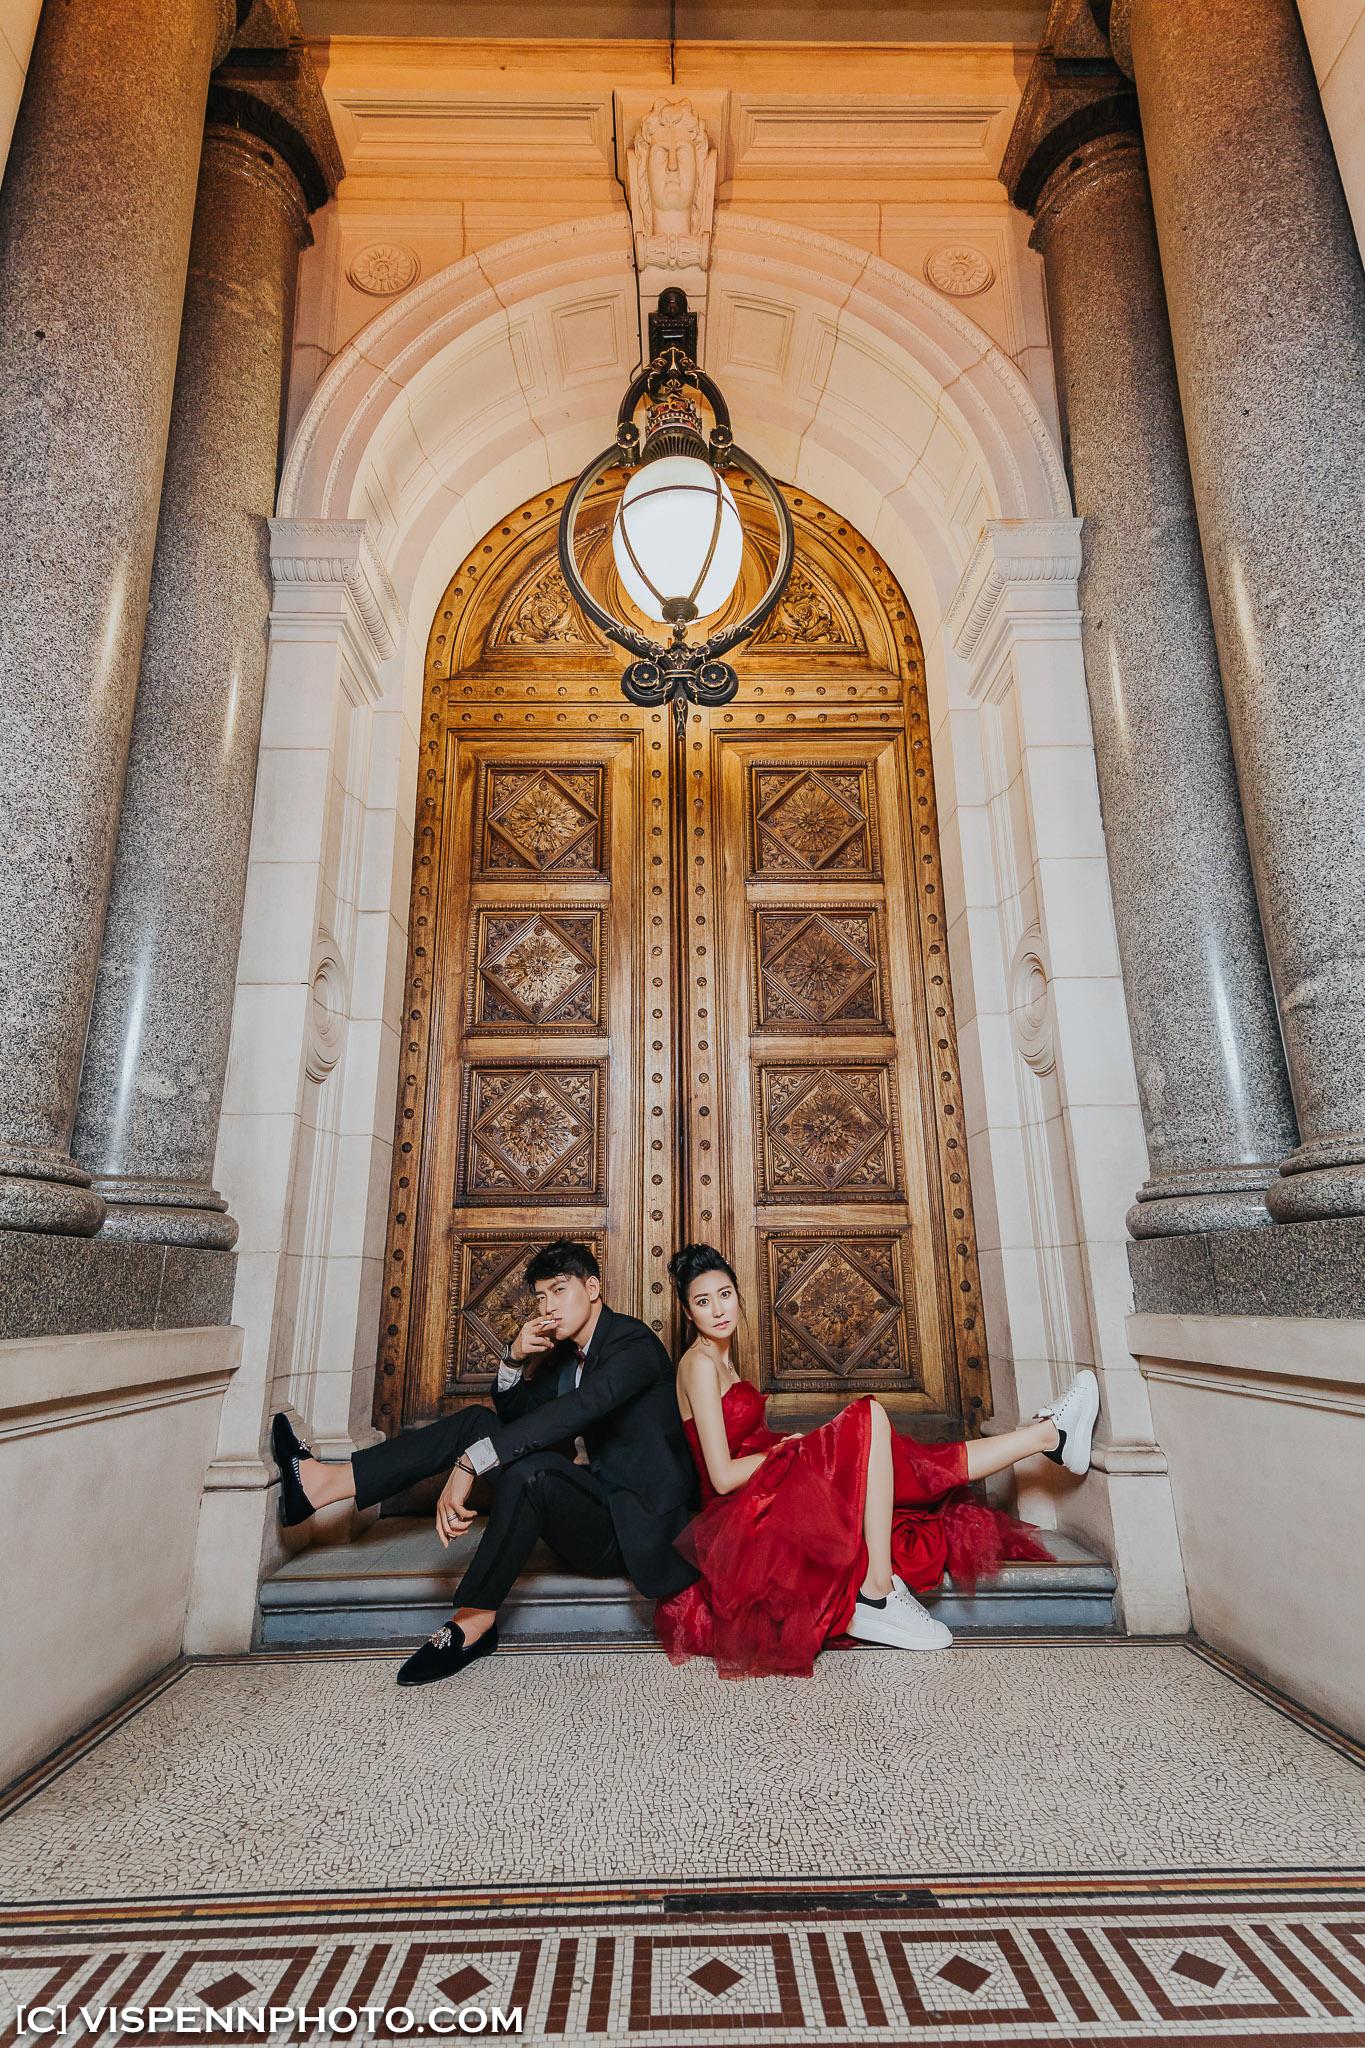 PRE WEDDING Photography Melbourne VISPENN 墨尔本 婚纱照 结婚照 婚纱摄影 5D4 4236